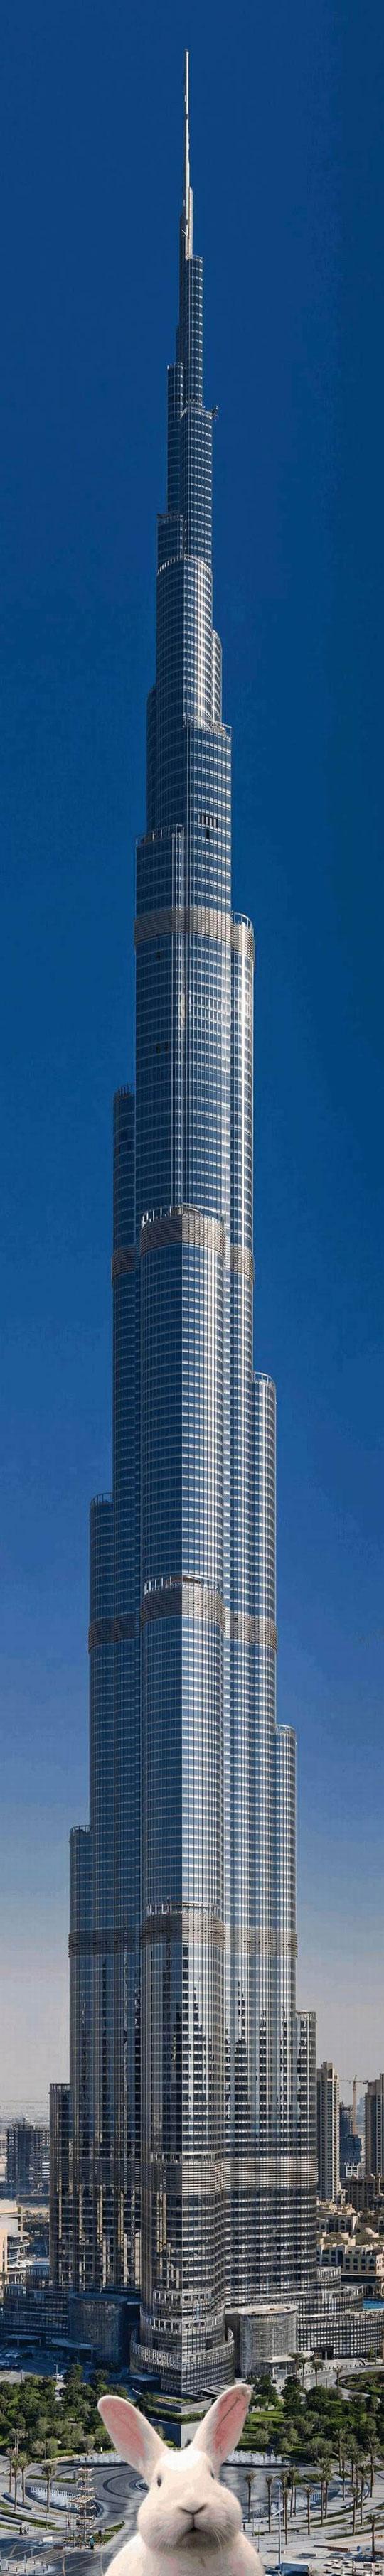 Meanwhile At The Burj Khalifa